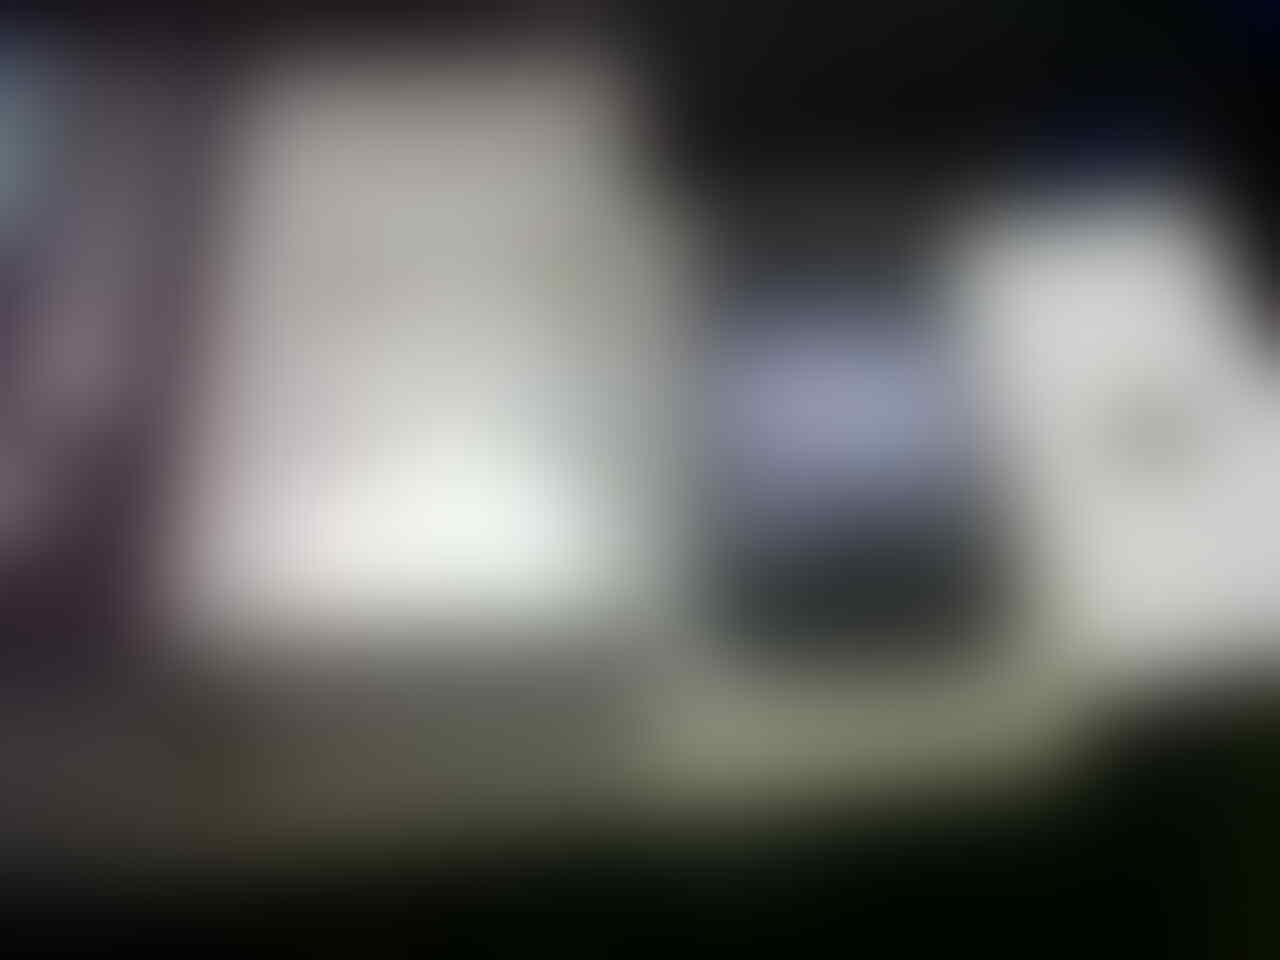 iphone4 16gb FU -LikeNEW-